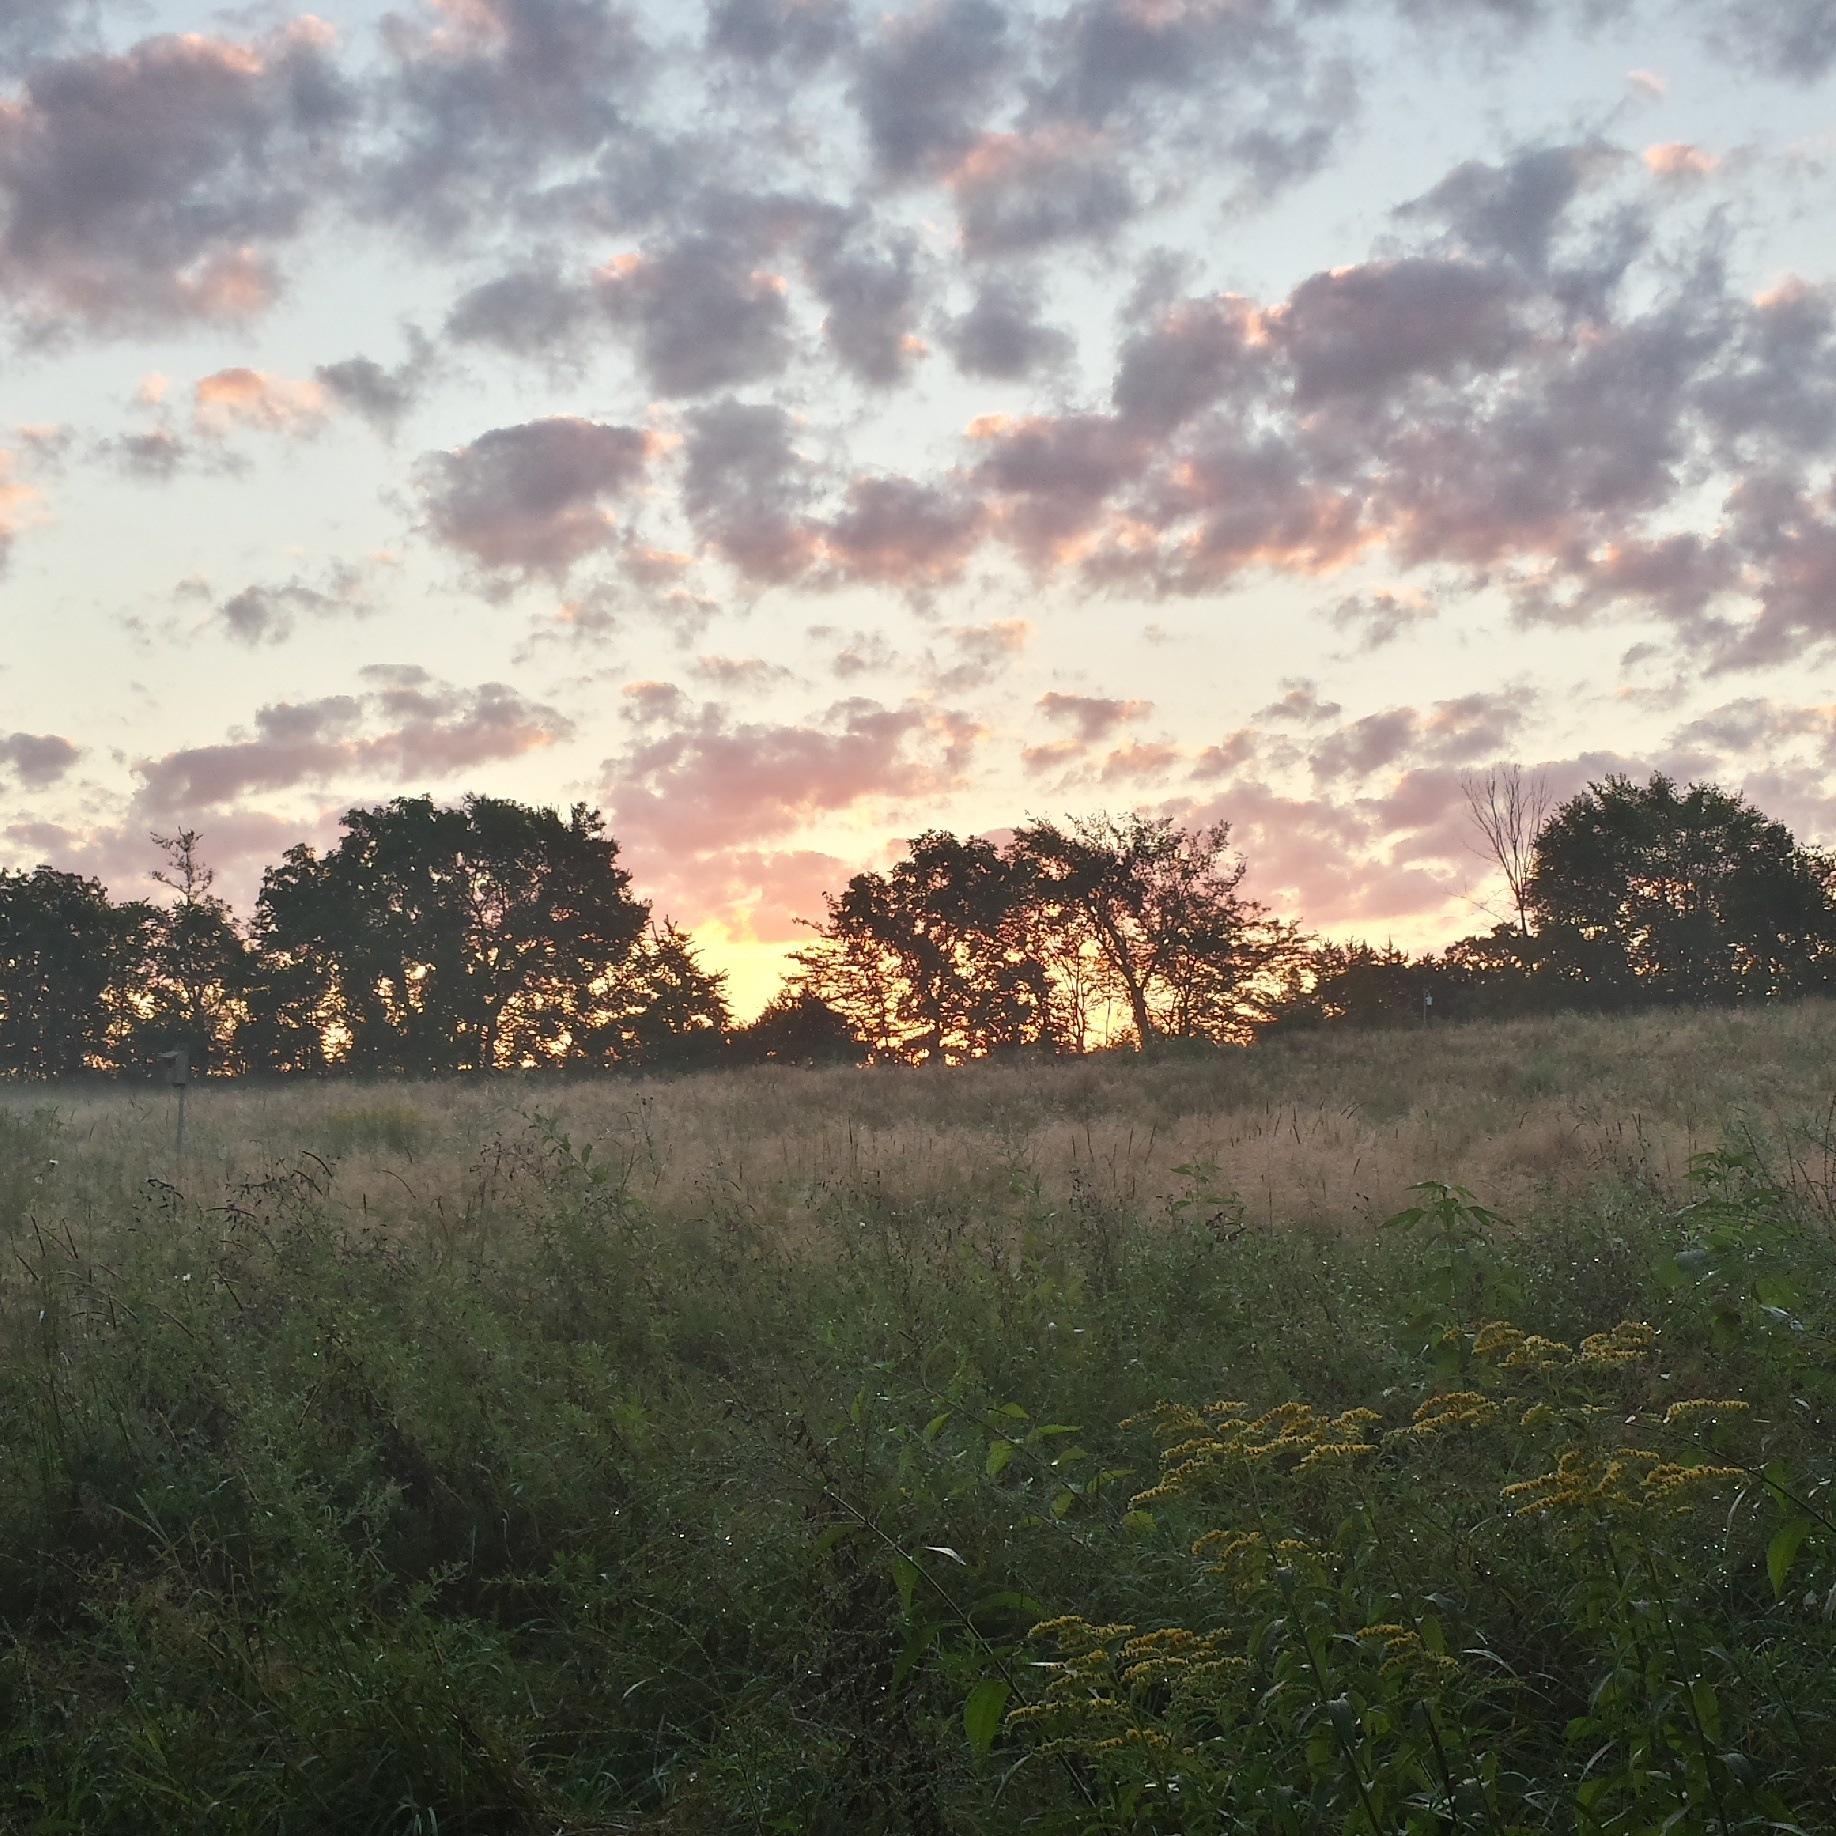 Summer sunrise by patgmcgovern